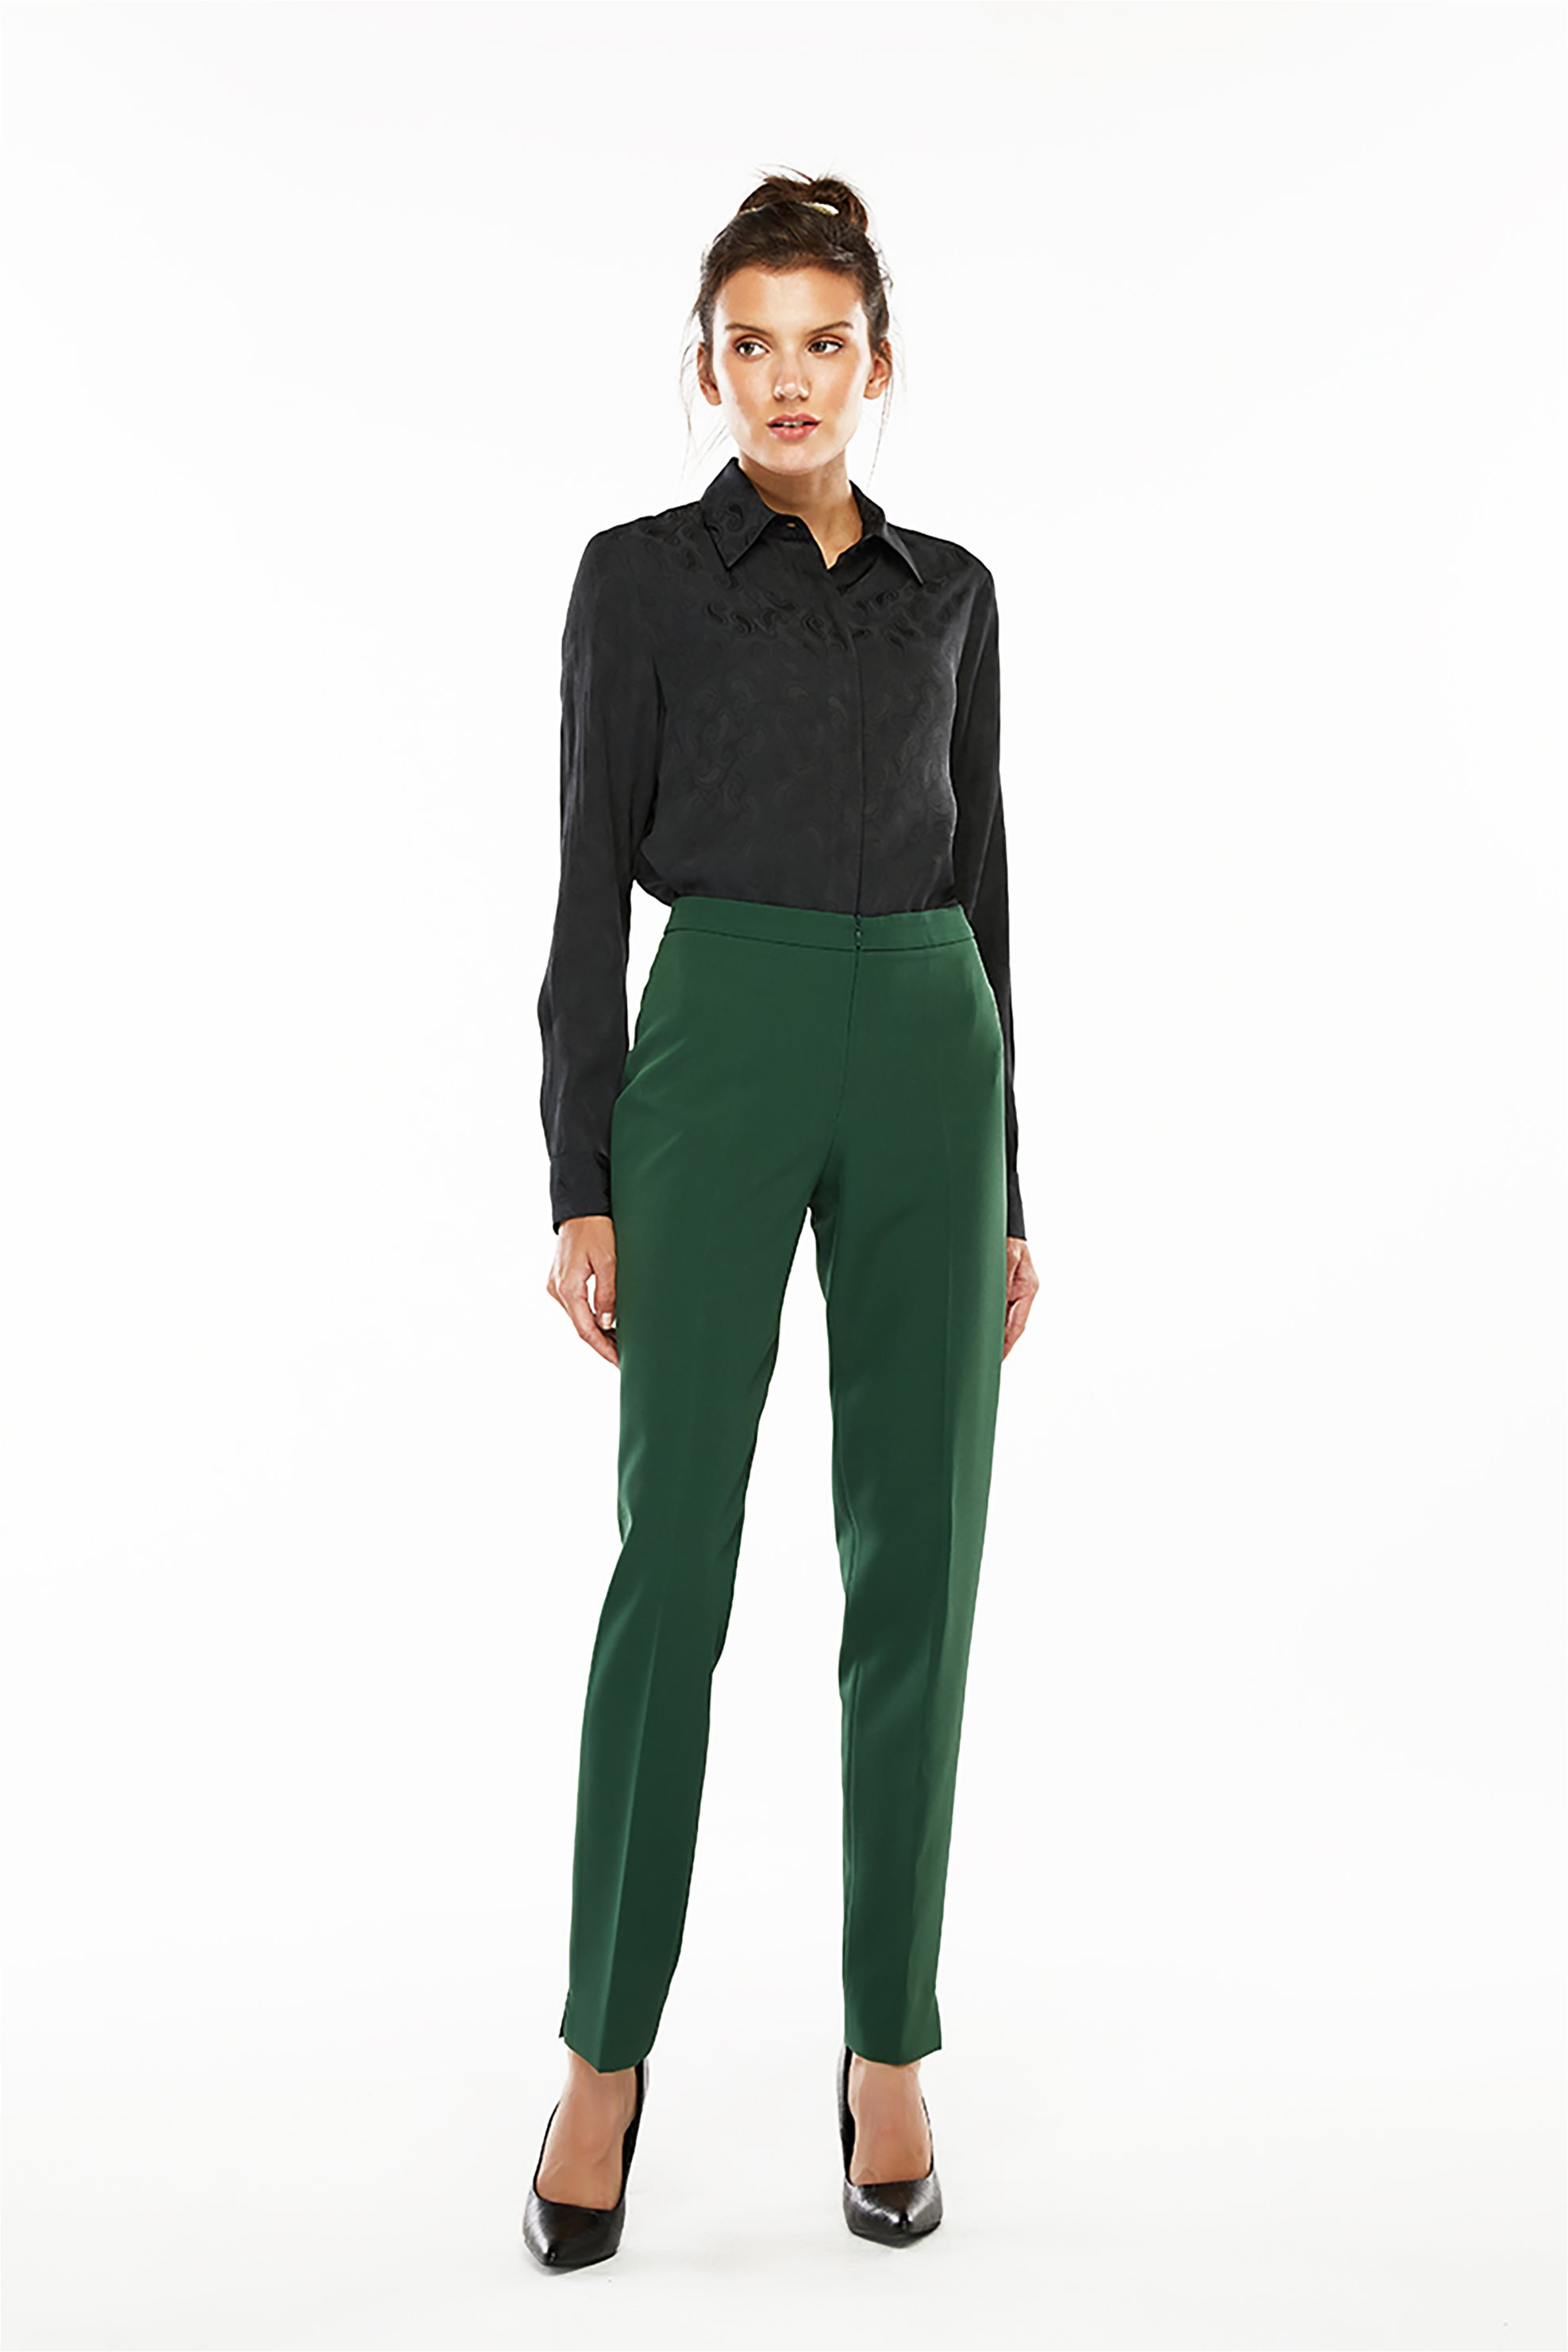 Jupe γυναικείο παντελόνι μονόχρωμο Straight Fit - 21.2O2.J03.001 - Πράσινο